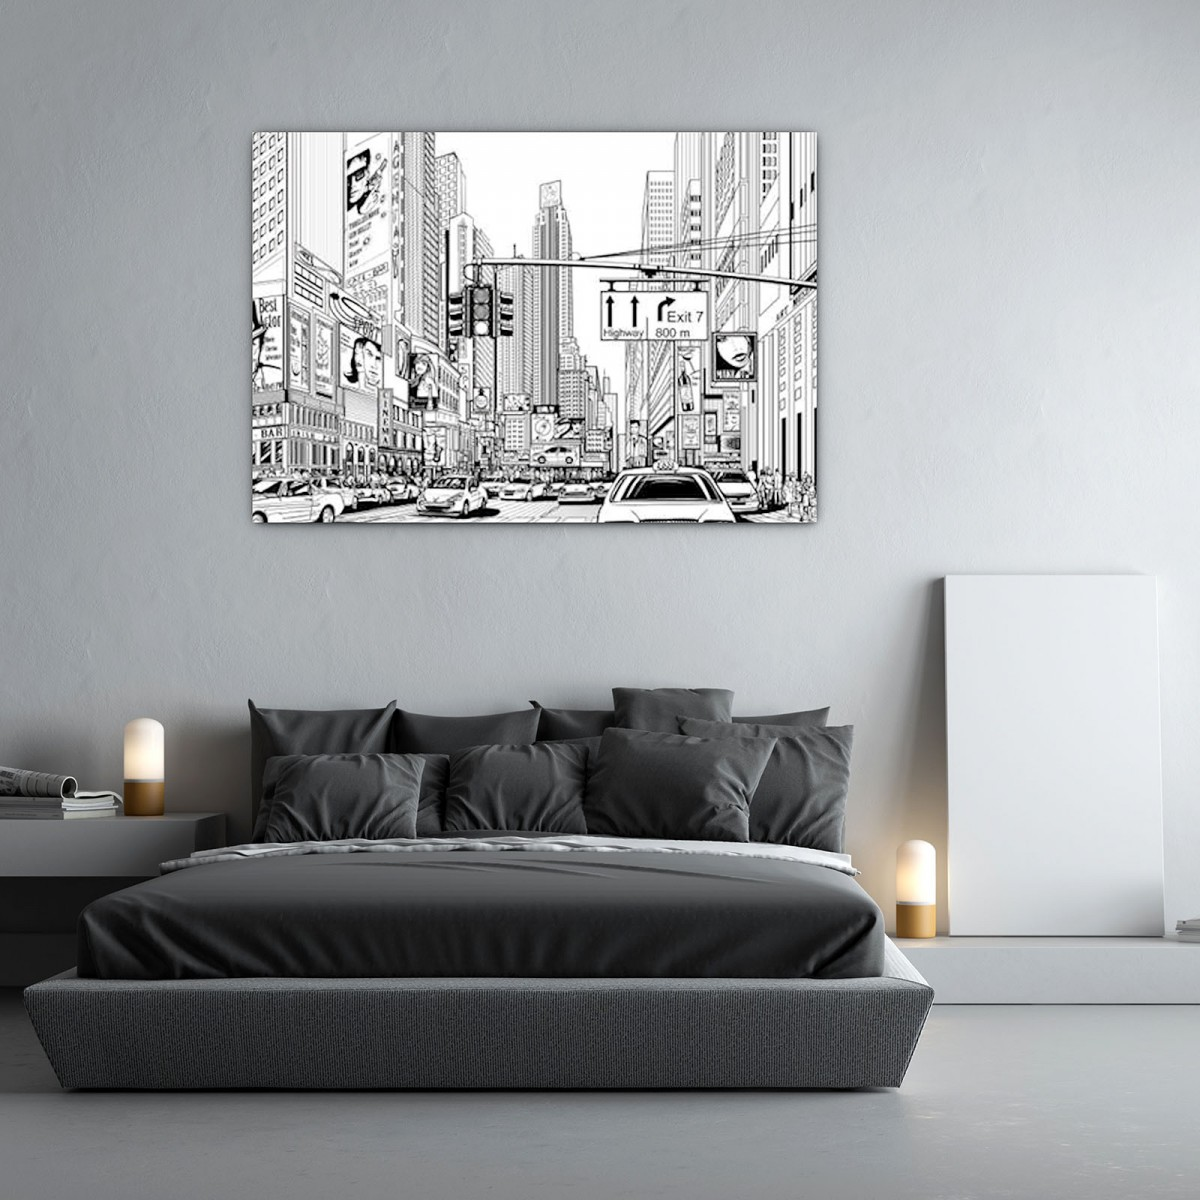 glasbild new york comic 989706818. Black Bedroom Furniture Sets. Home Design Ideas